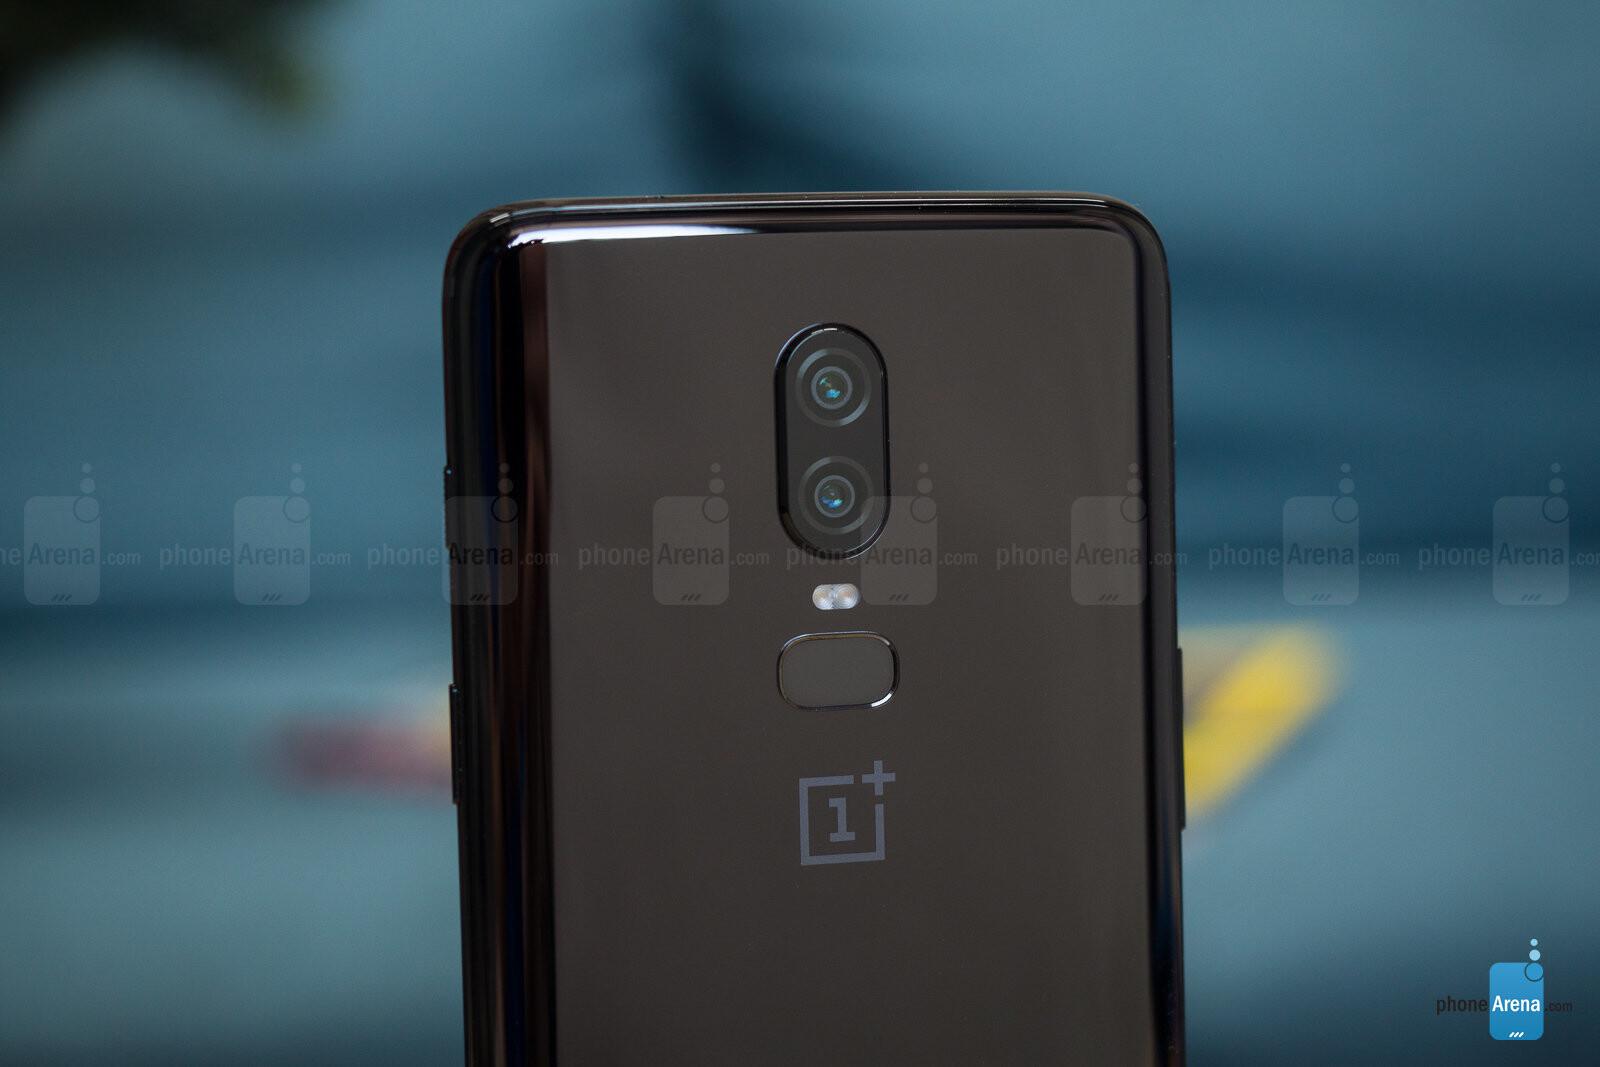 OnePlus 6 Review - PhoneArena